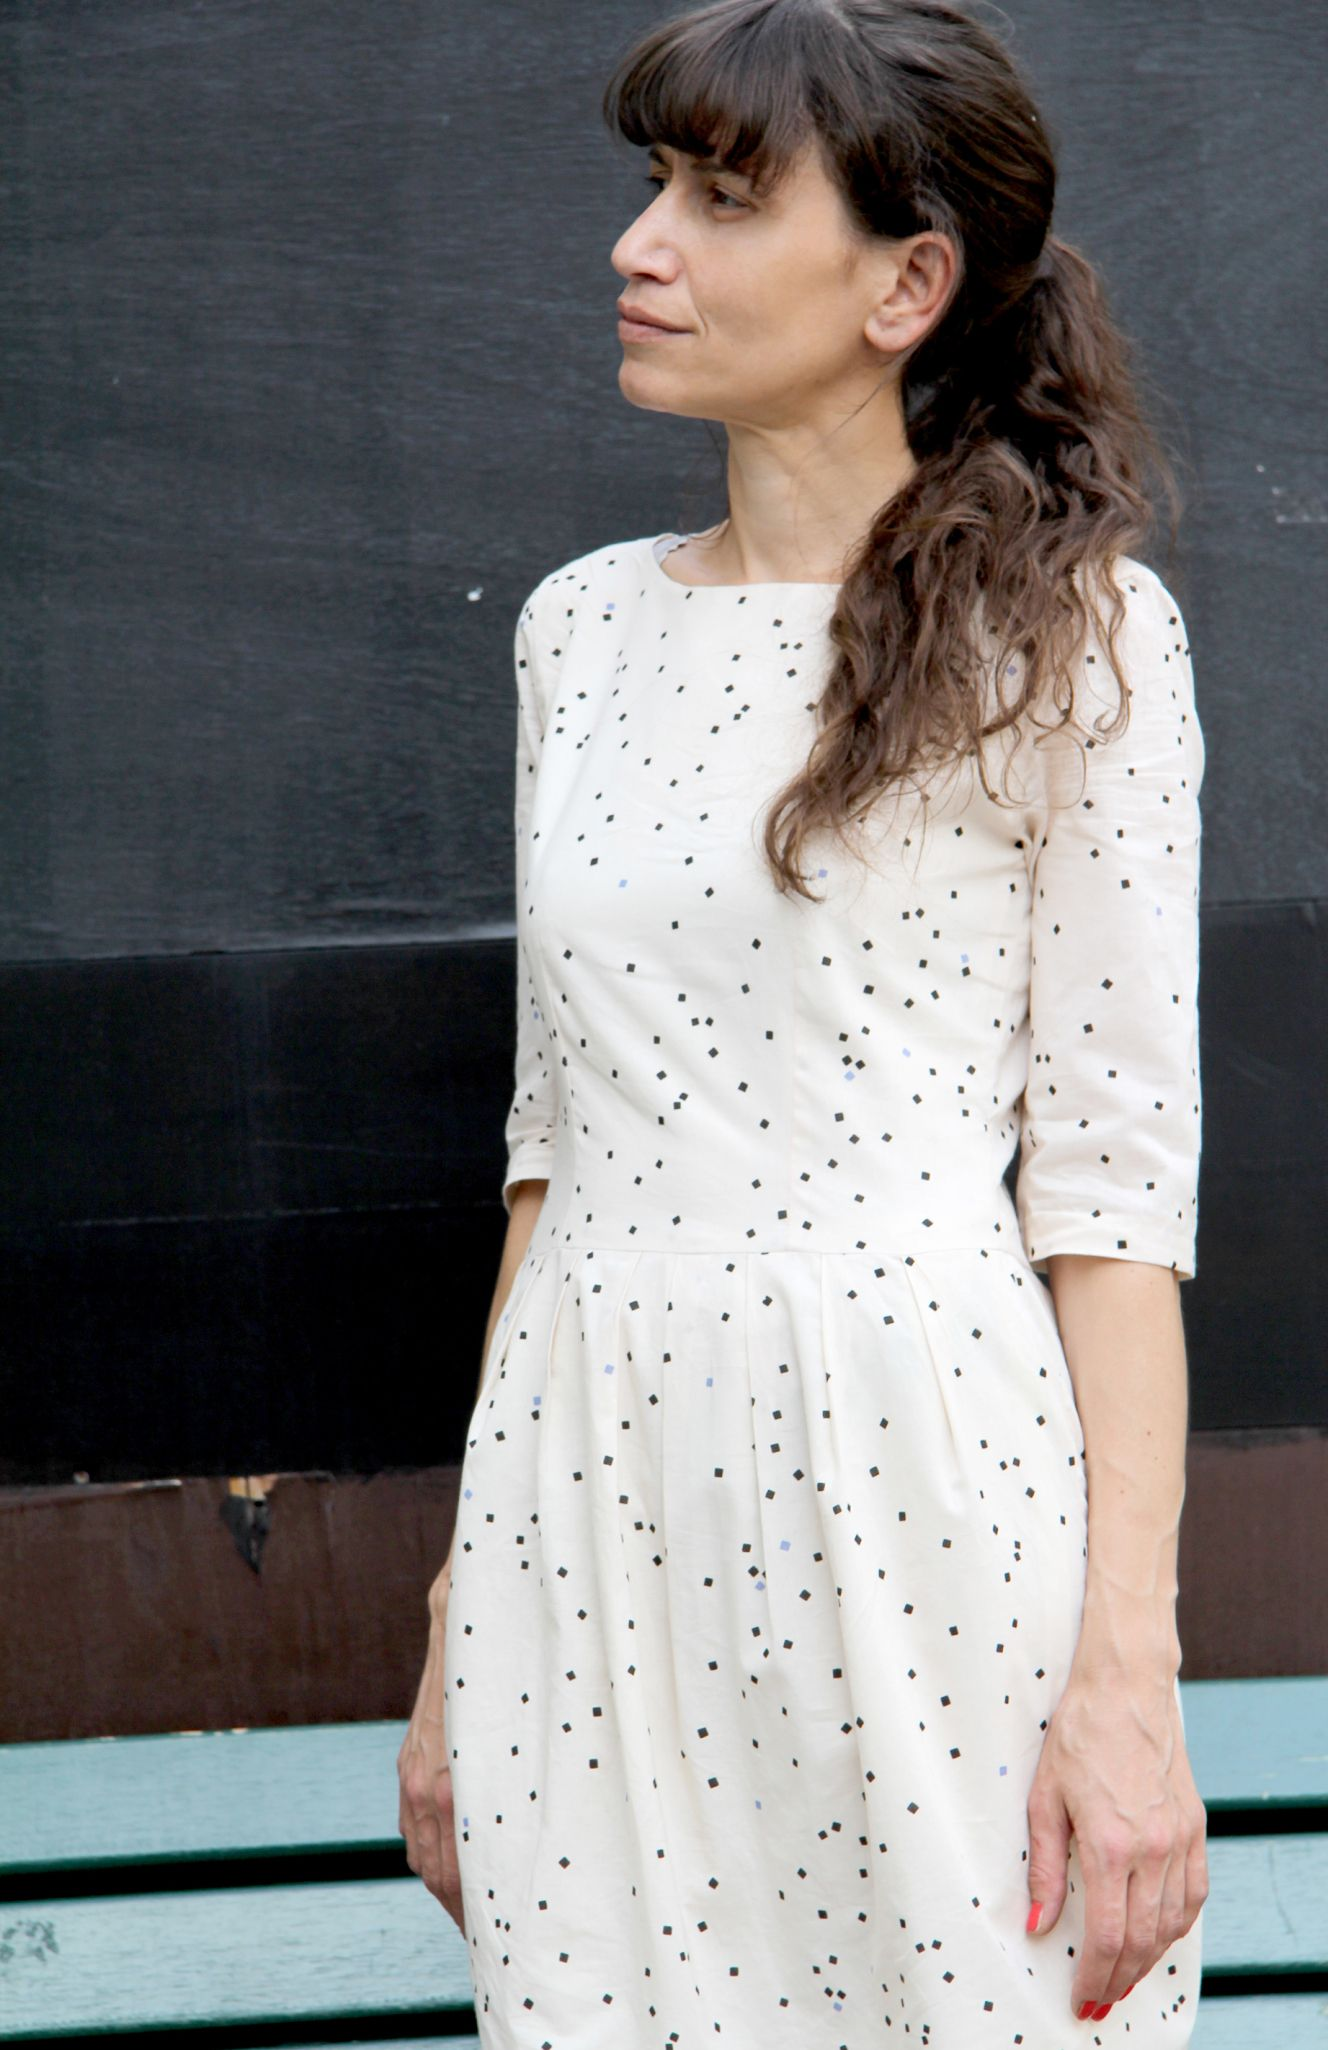 Tanja dress // Jolies bobines